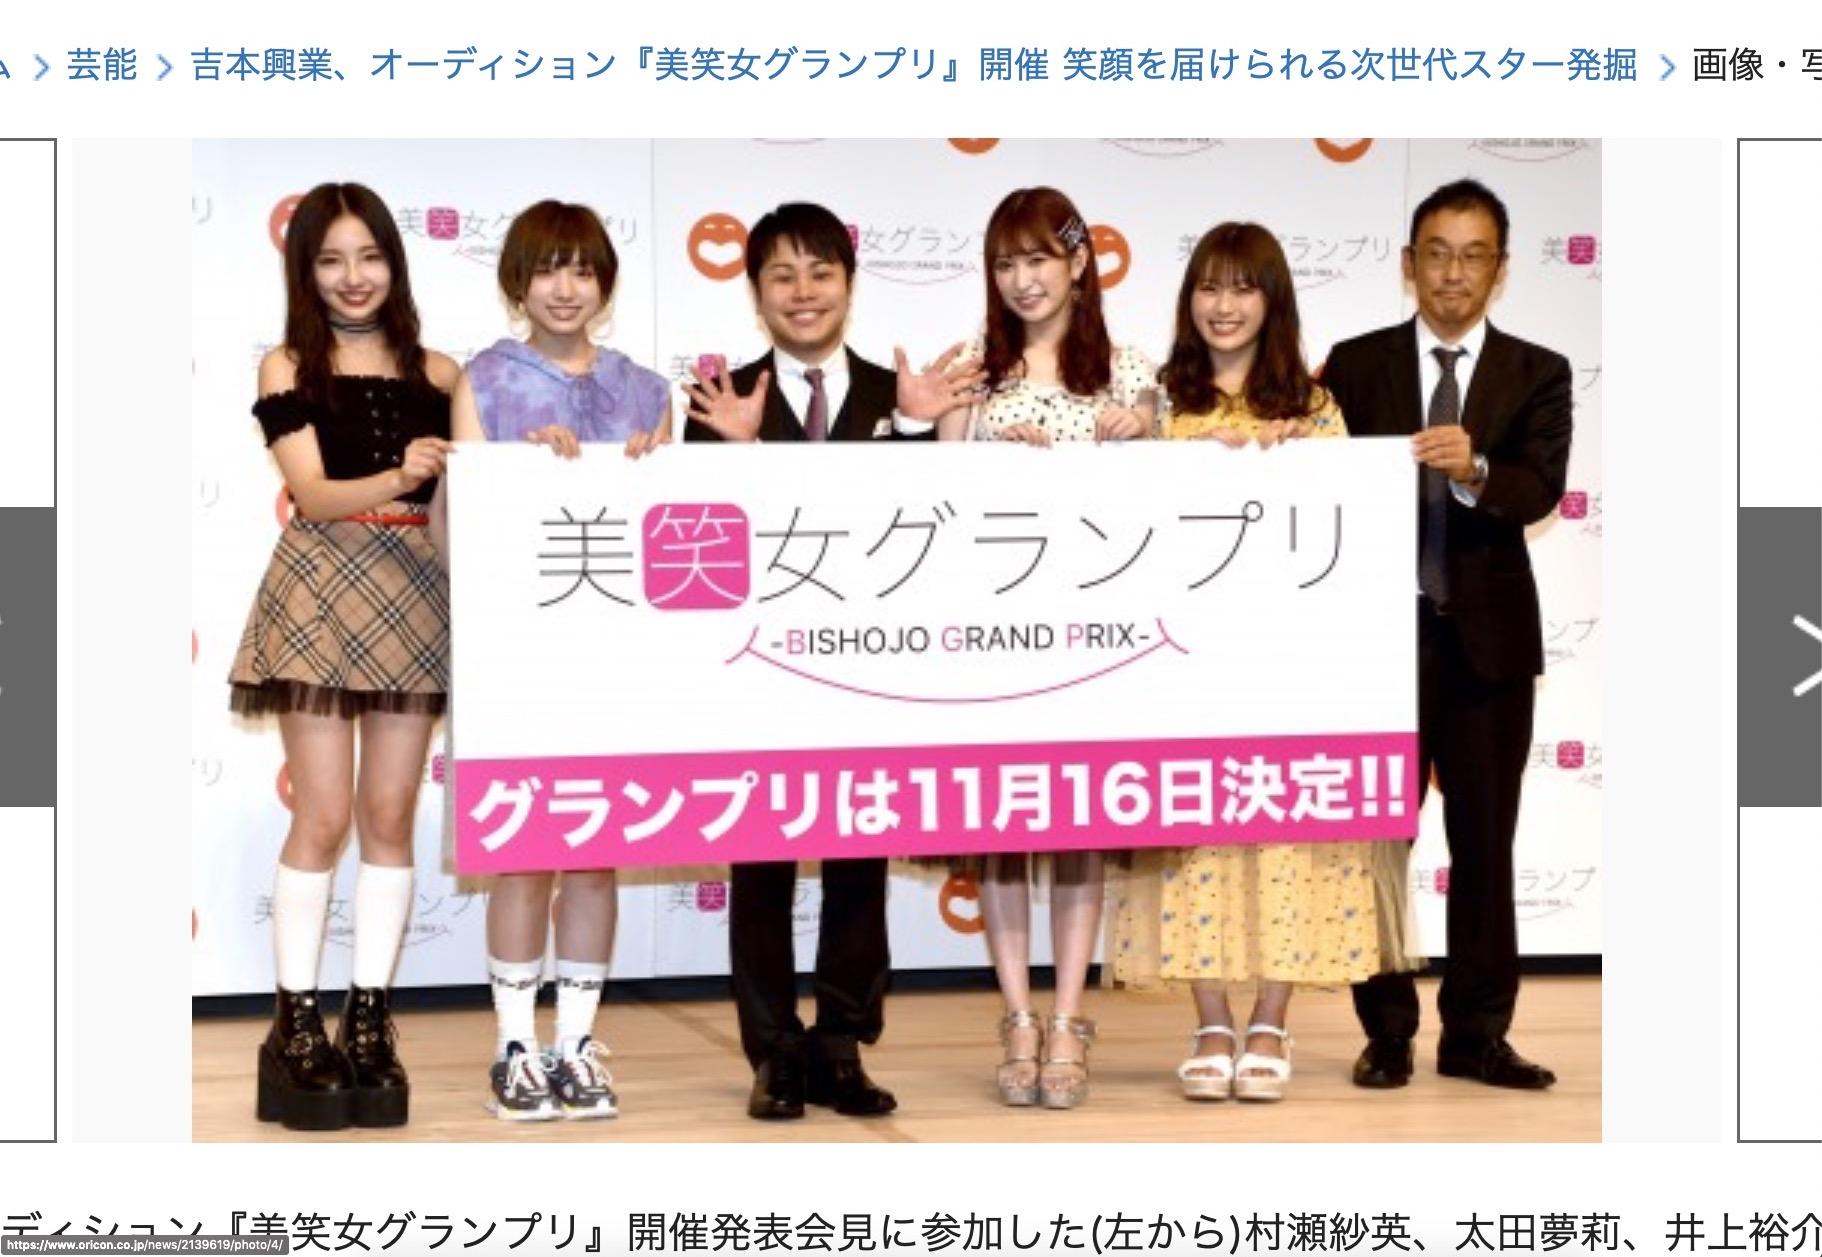 【NMB48】吉本興業主催「美笑女グランプリ」スペシャルサポーターにQueentet